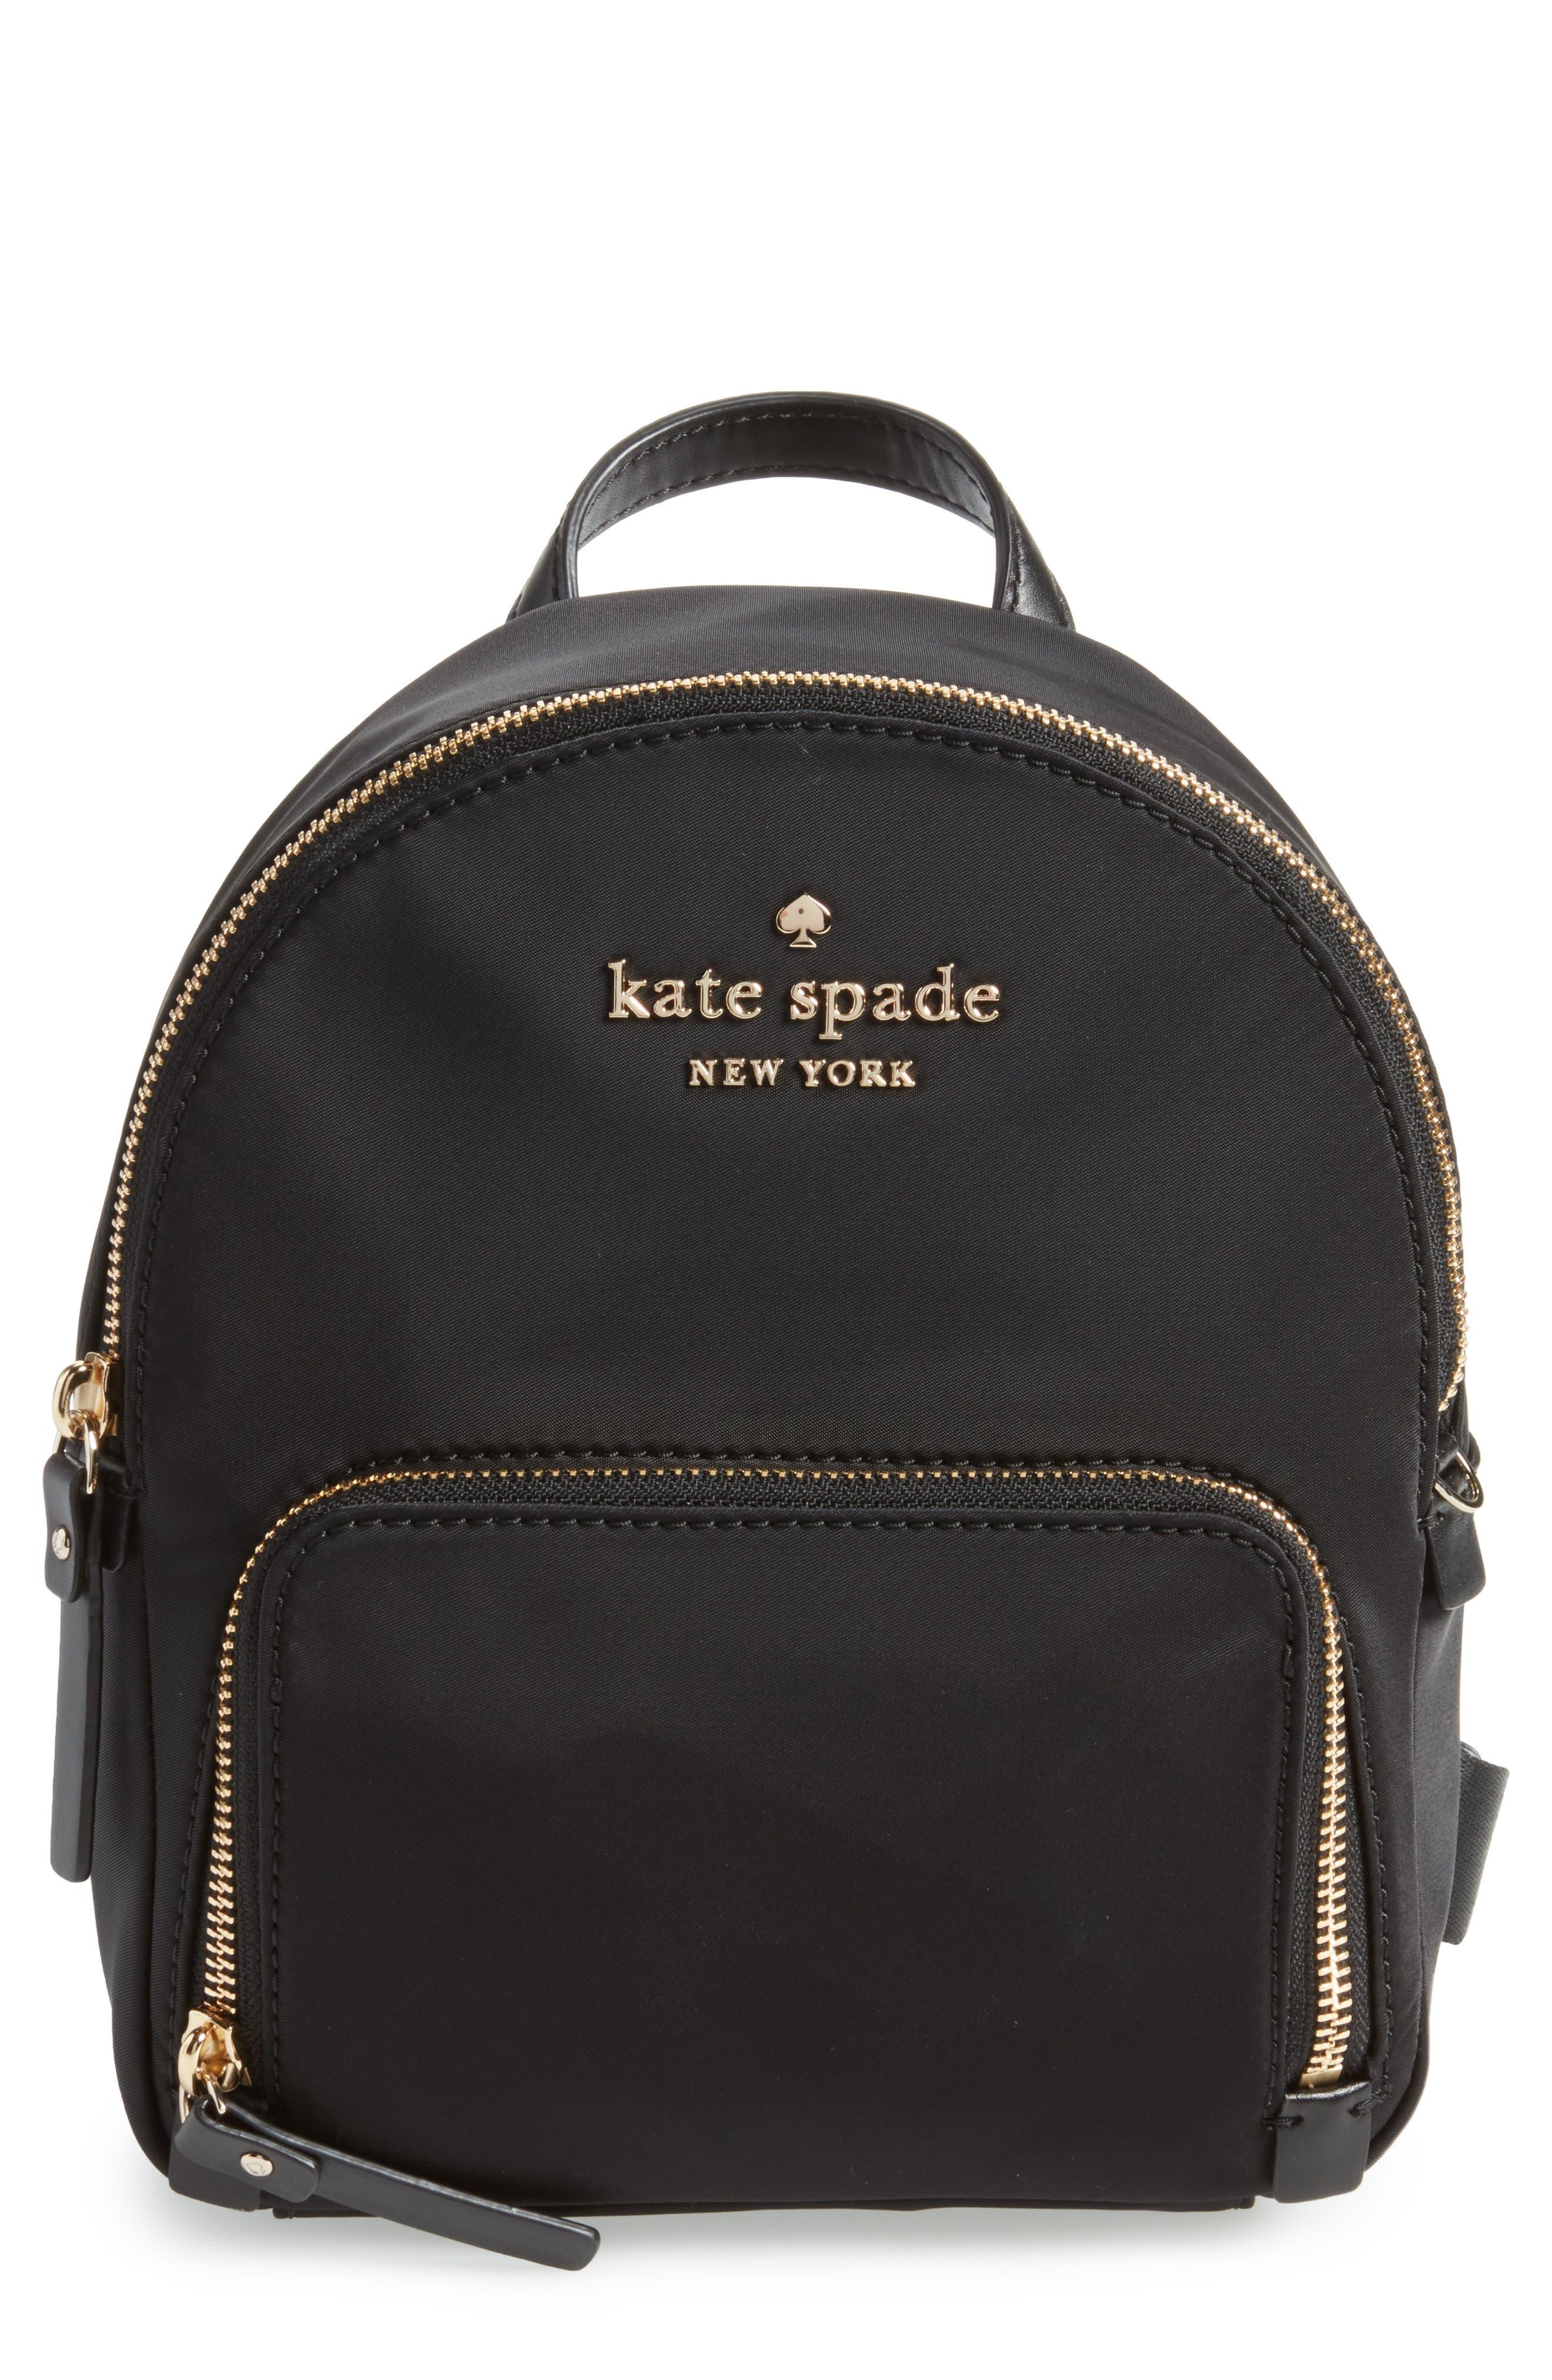 d90d4f5cac1d Women's kate spade new york Handbags | Nordstrom